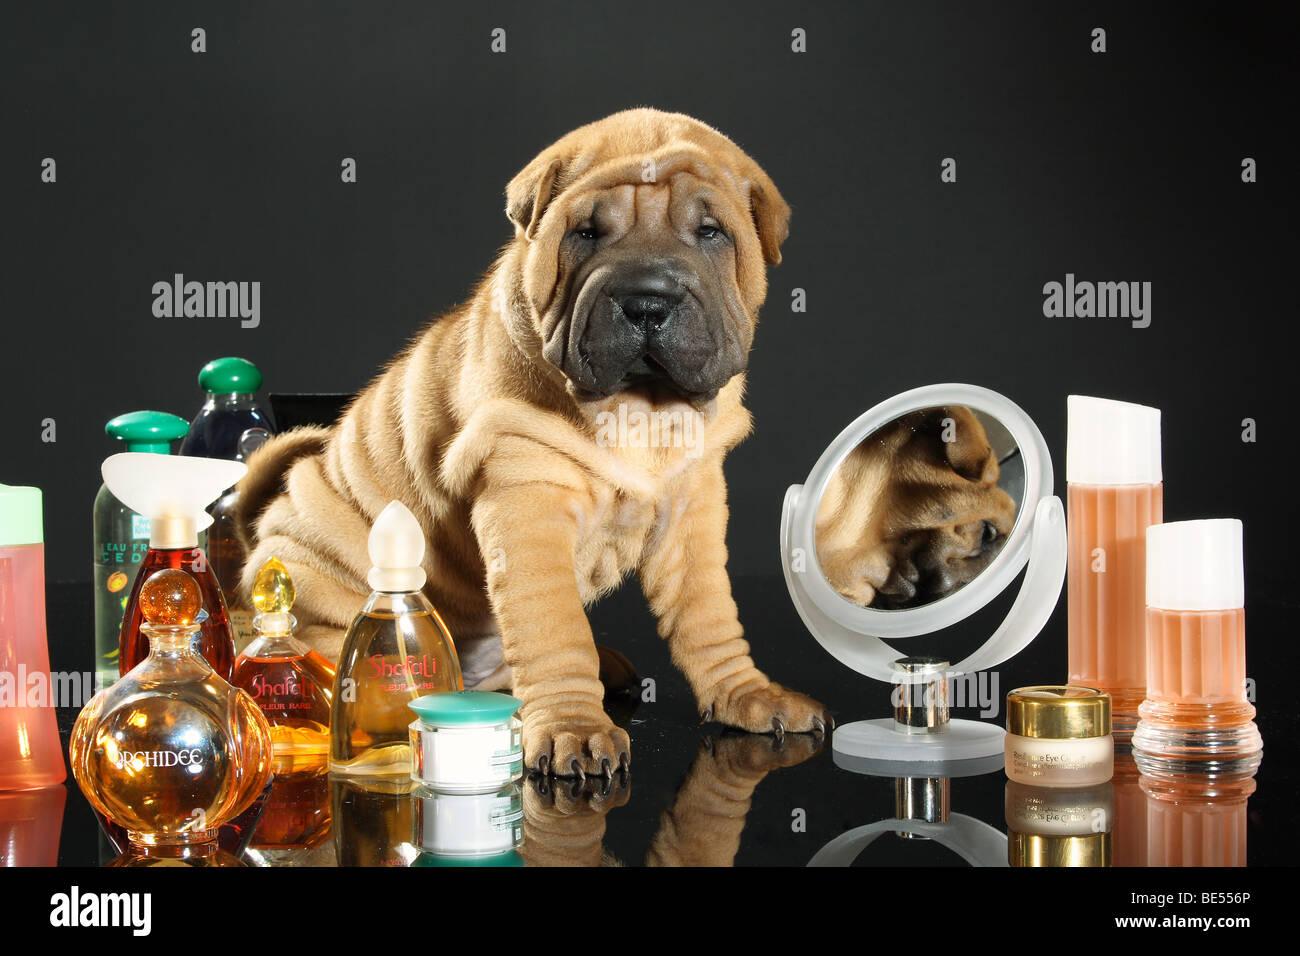 Shar Pei dog - puppy sitting between perfume bottles - Stock Image